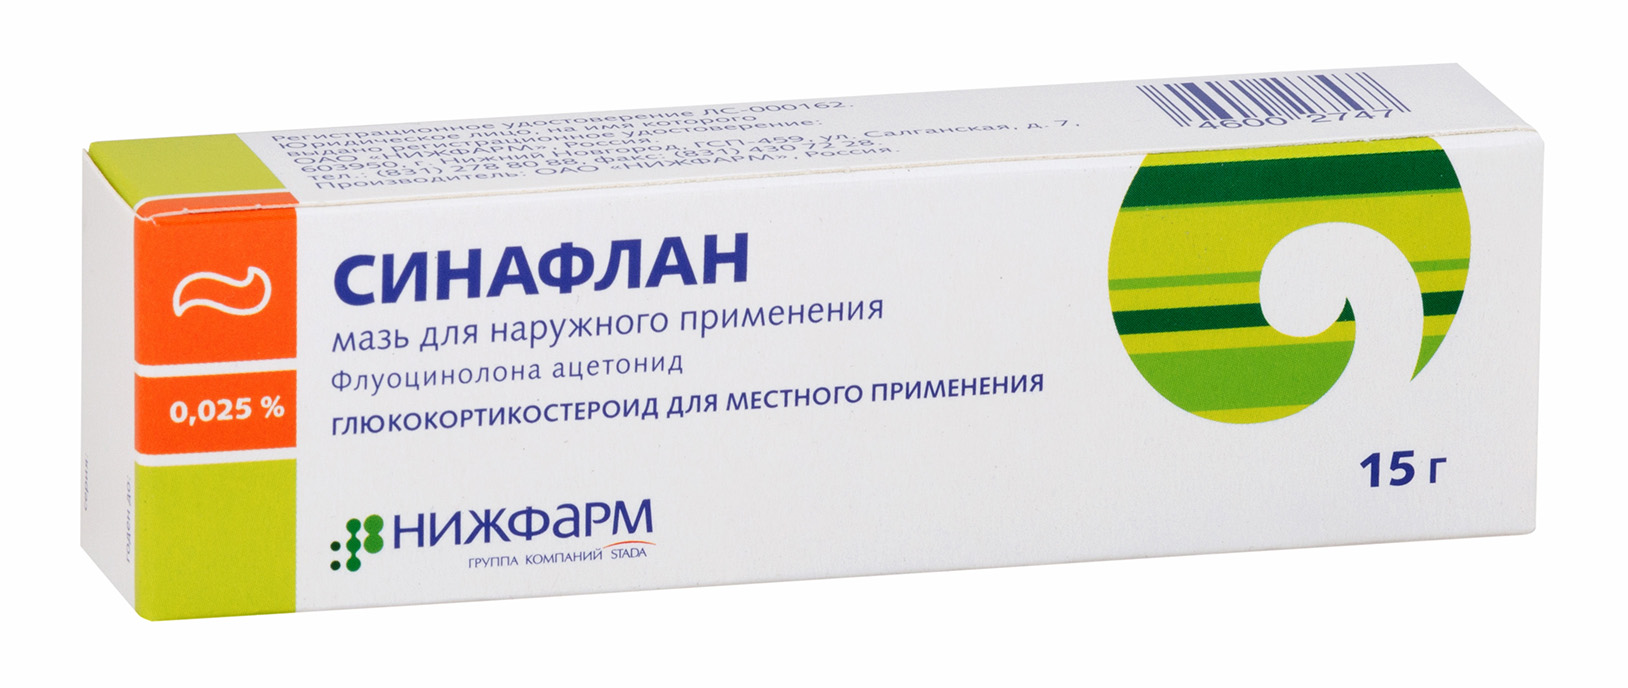 Синафлан мазь 0,025% 15г №1 Нижфарм